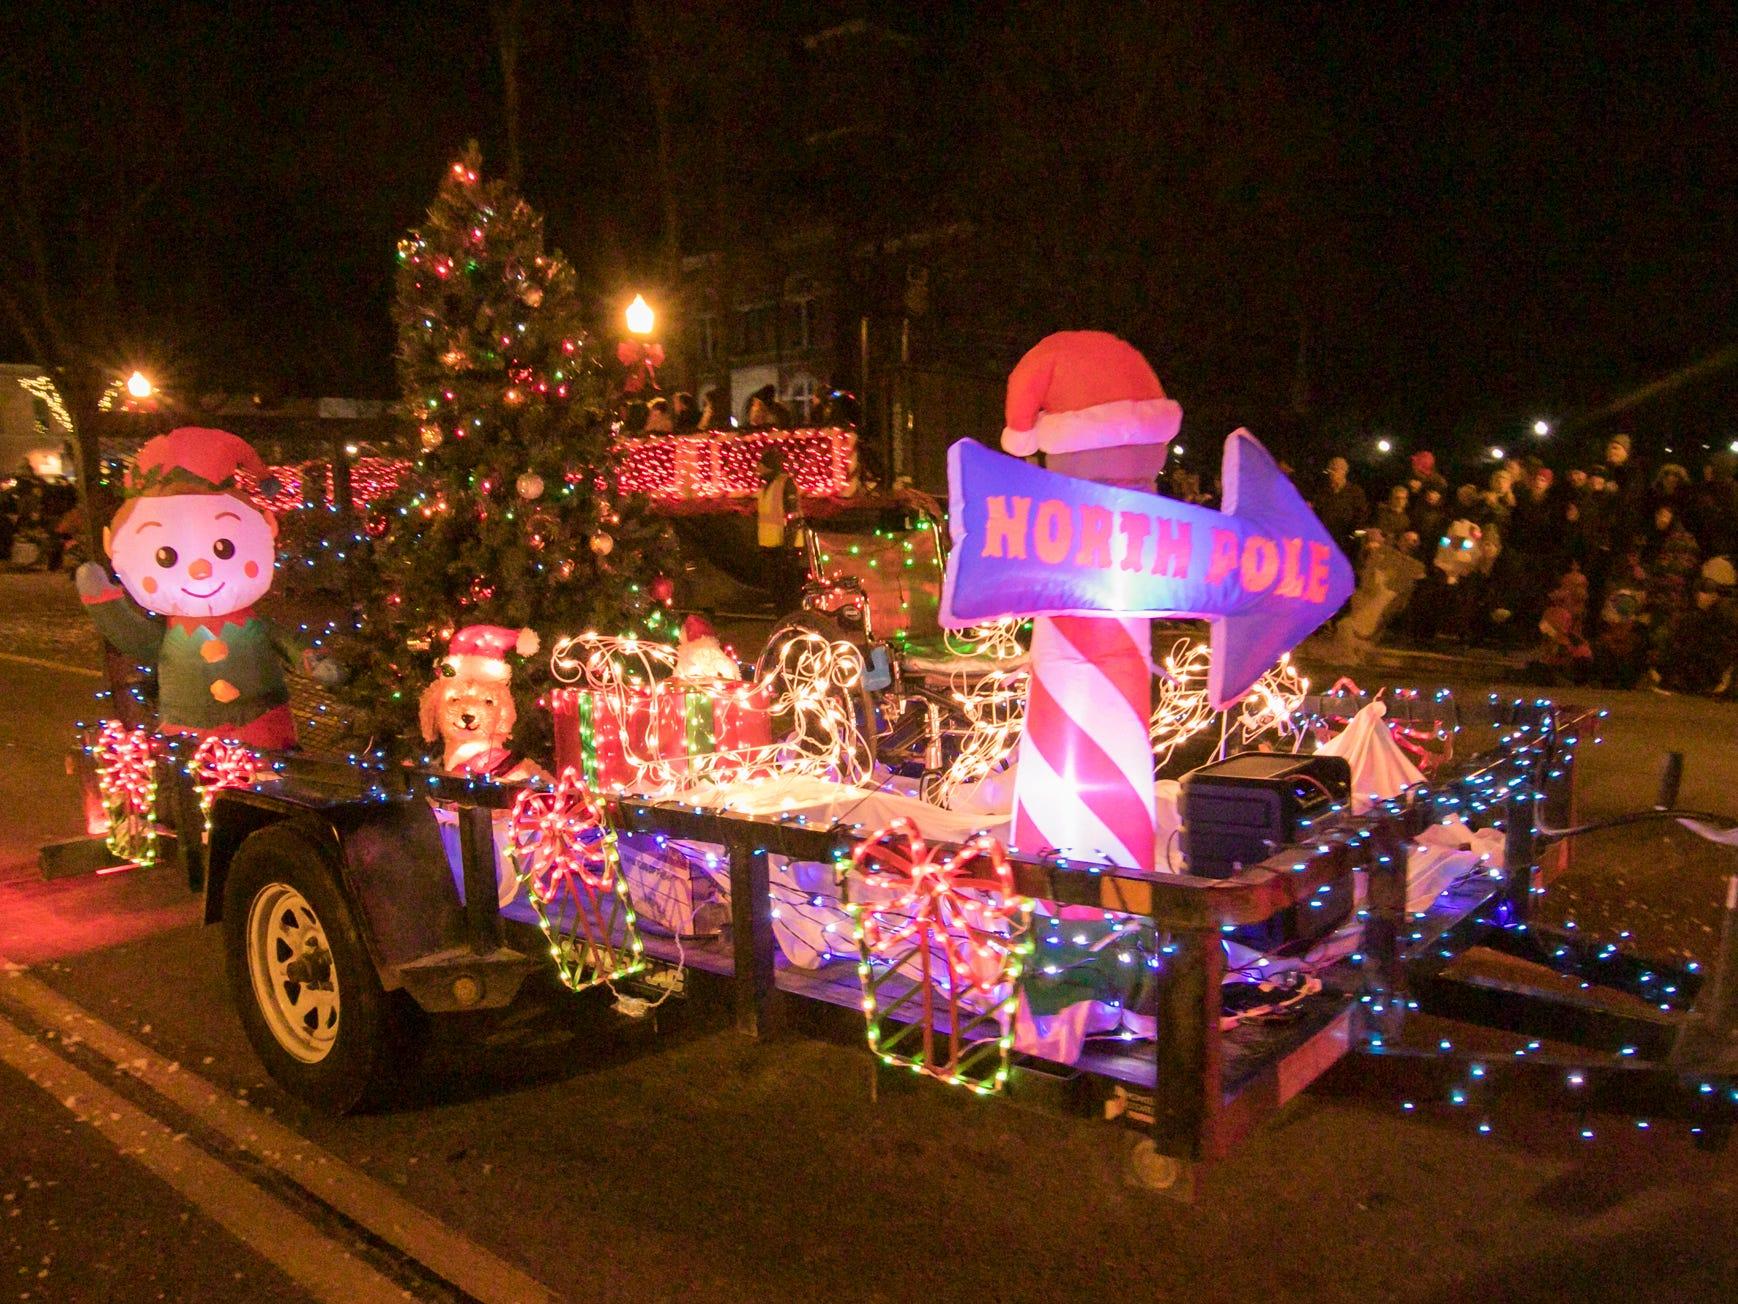 The Medilodge of Livingston float in the Fantasy of Lights parade Friday, Nov. 23, 2018.